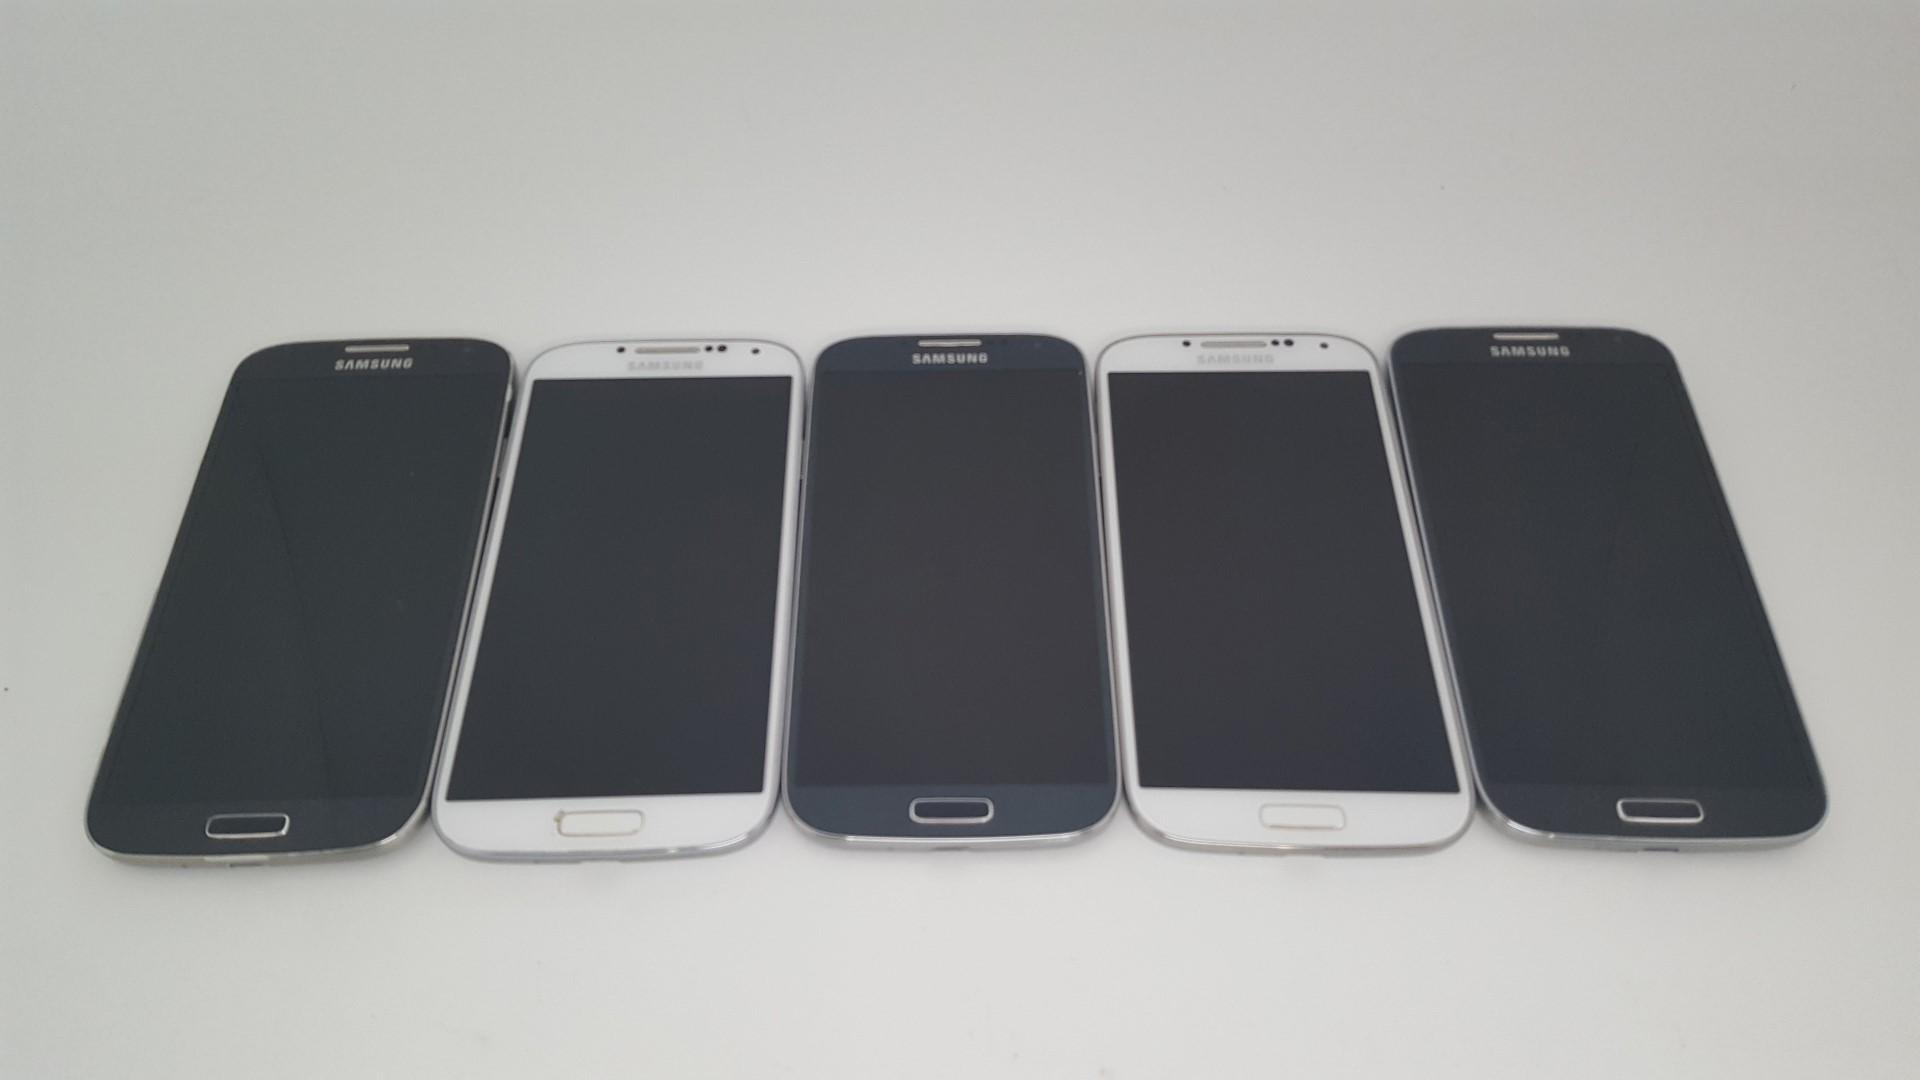 154 Samsung Galaxy S4 Sgh I337m Unlocked Wireless Association